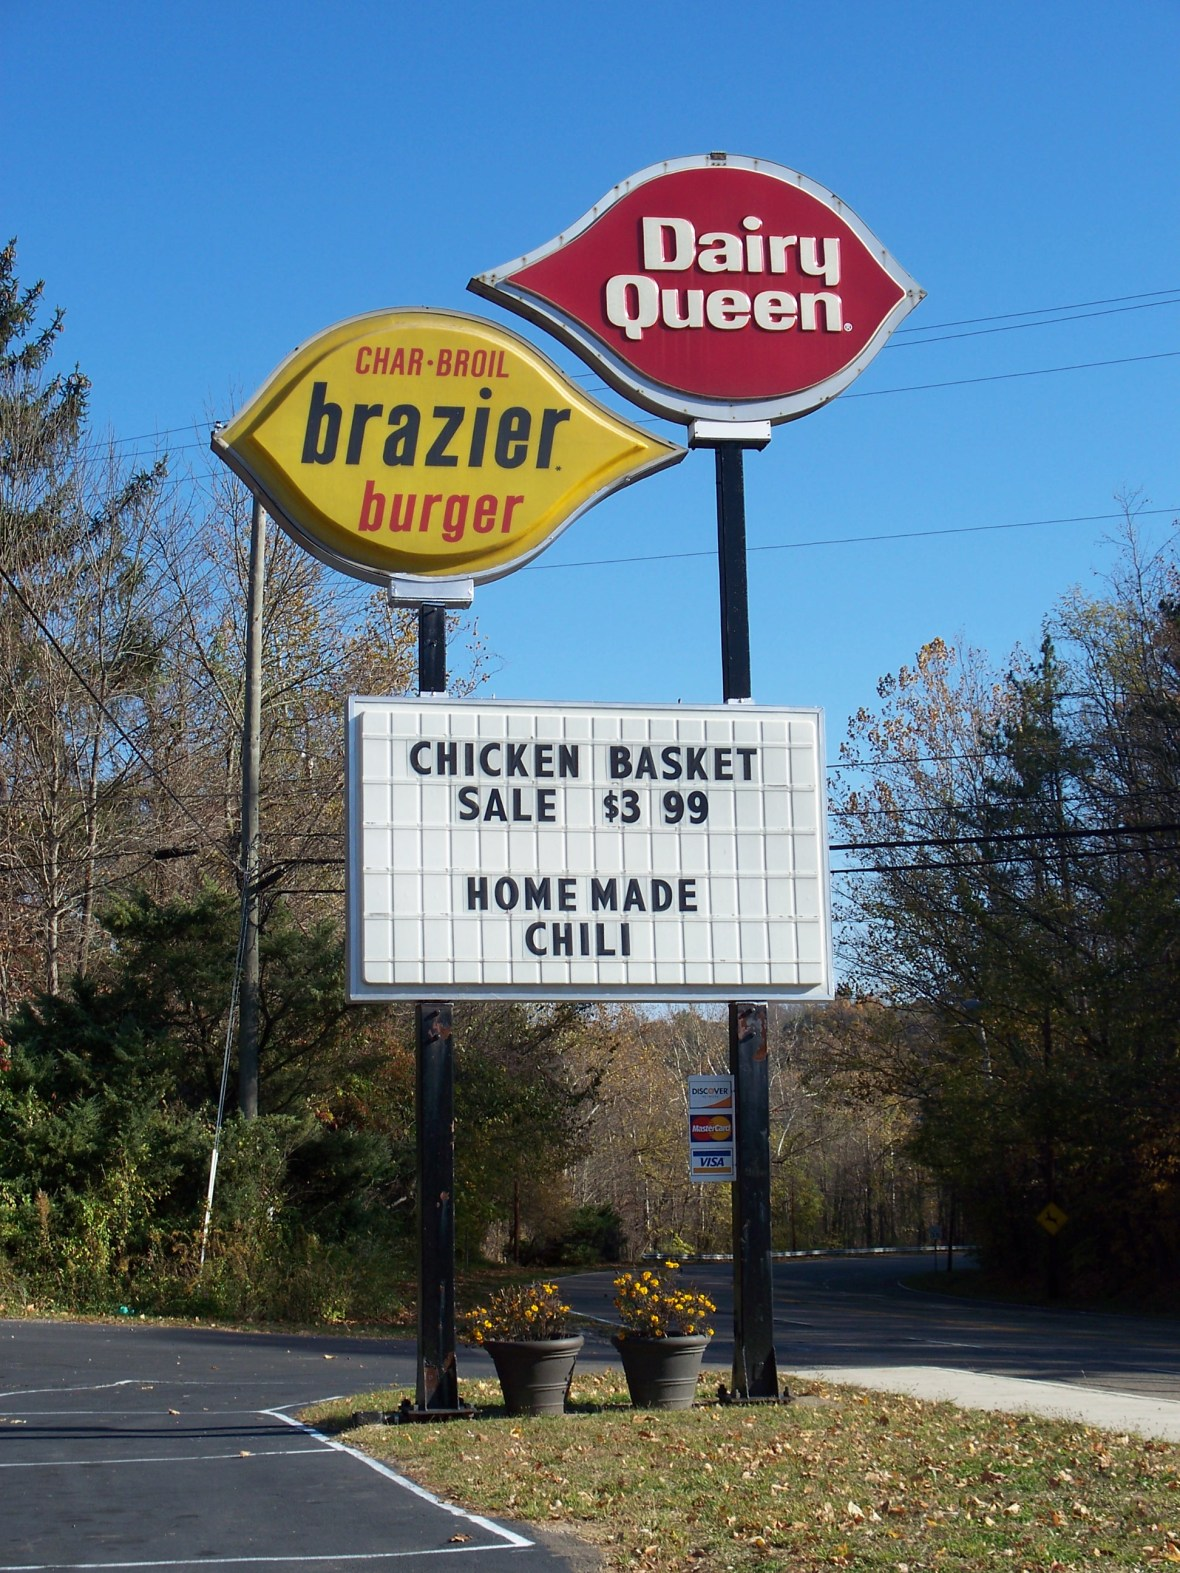 Dairy Queen Brazier - 70 Columbus Road, Athens, Ohio U.S.A. - October 22, 2010